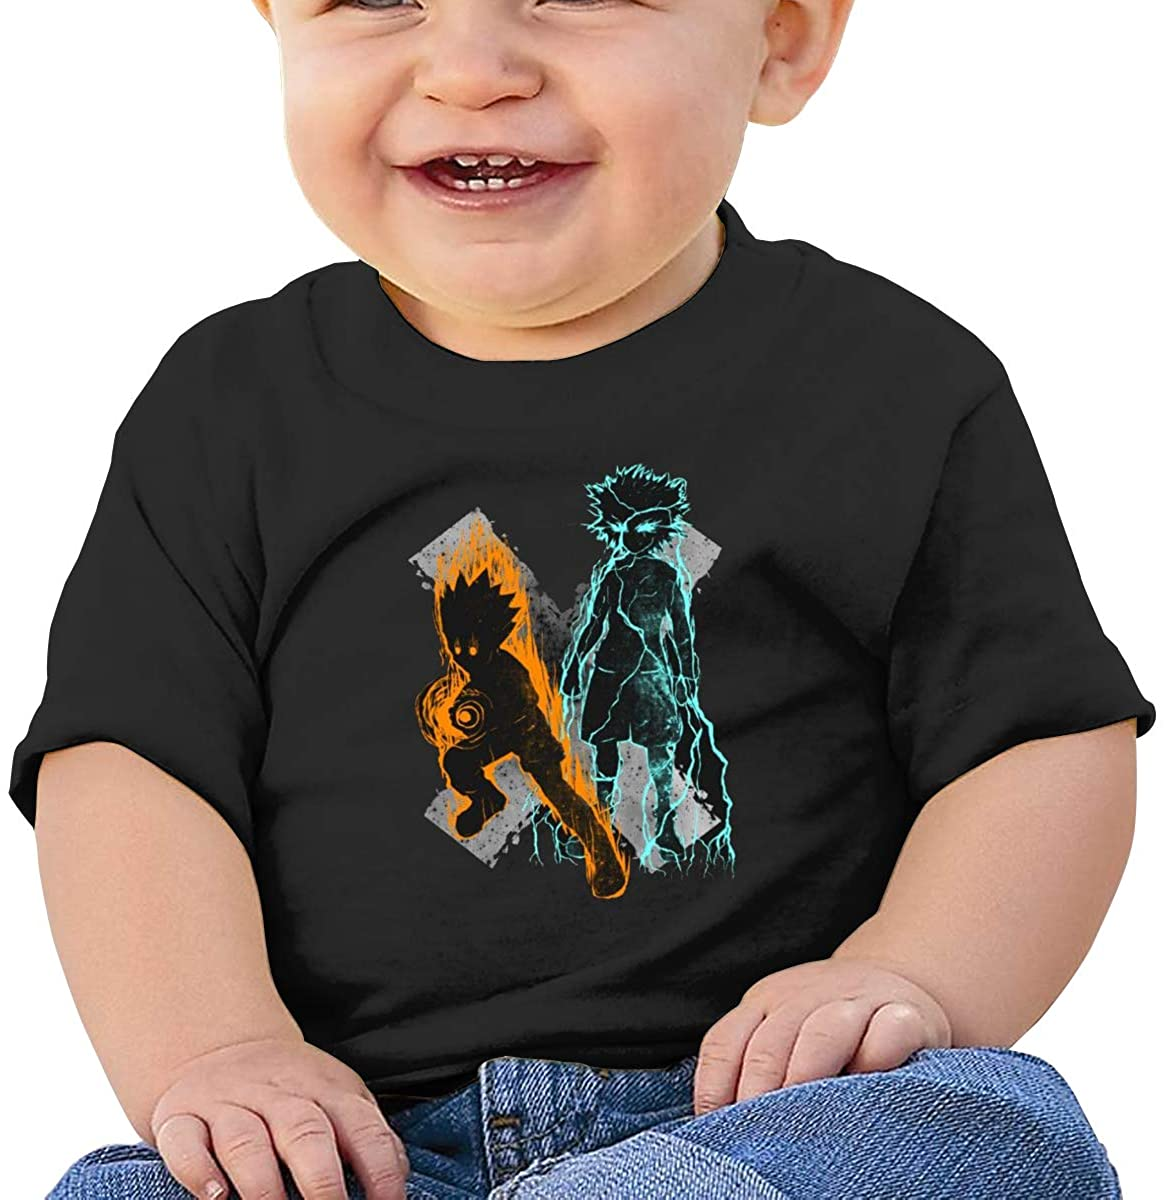 Colorful Short-Sleeved Comfortable and Refreshing Shirt Hunter X Hunter Baby T-Shirt